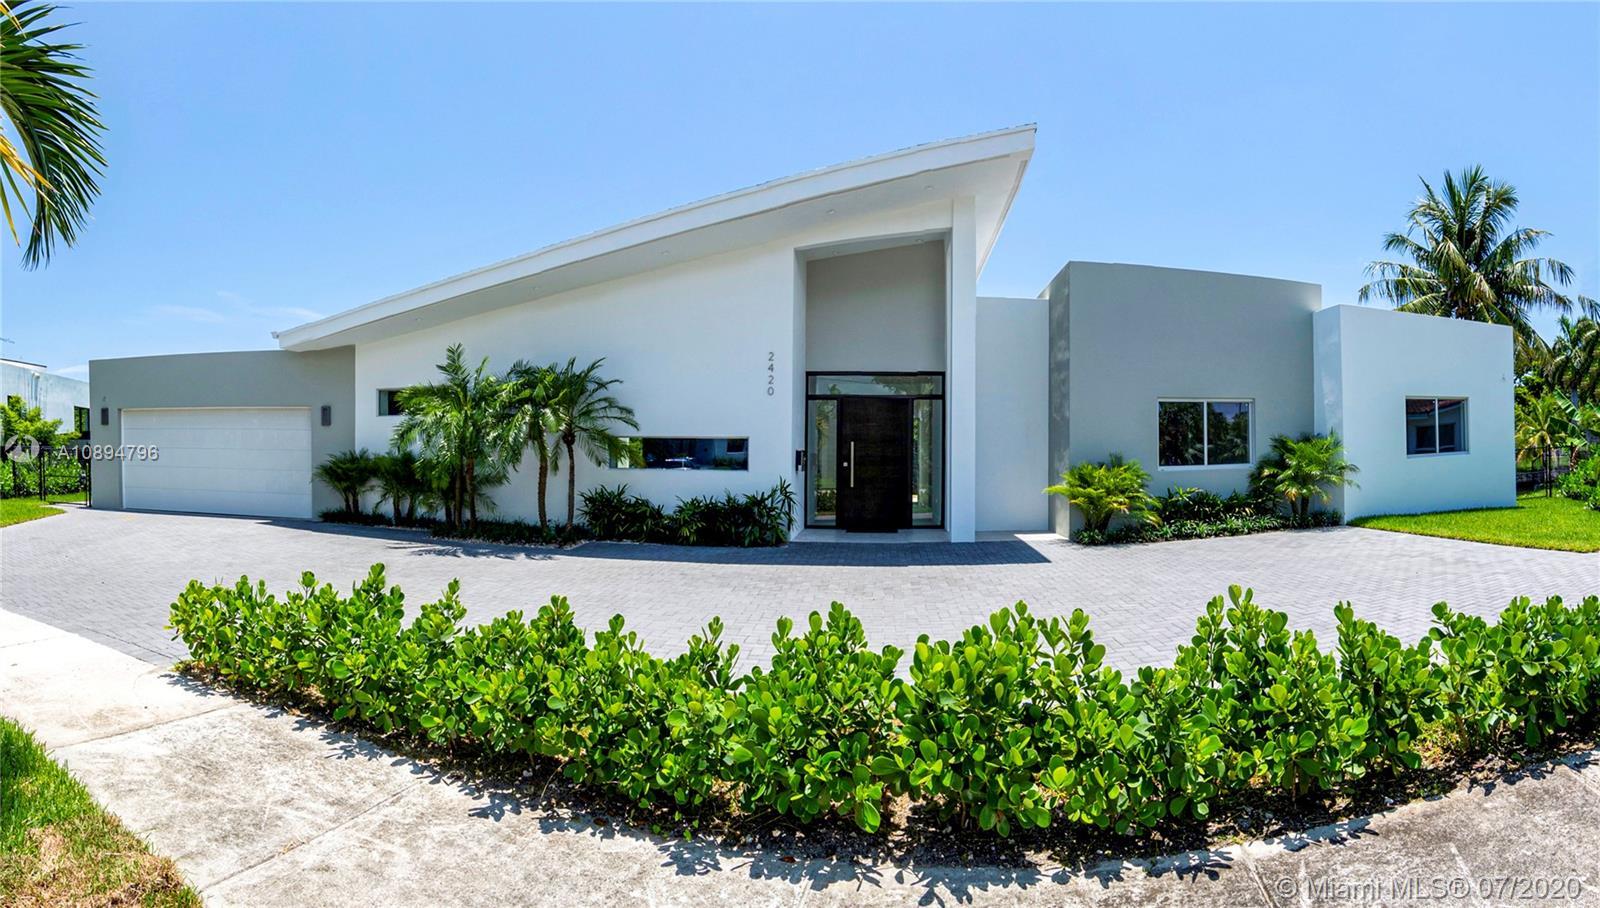 2420 NE 194th St, Miami, Florida 33180